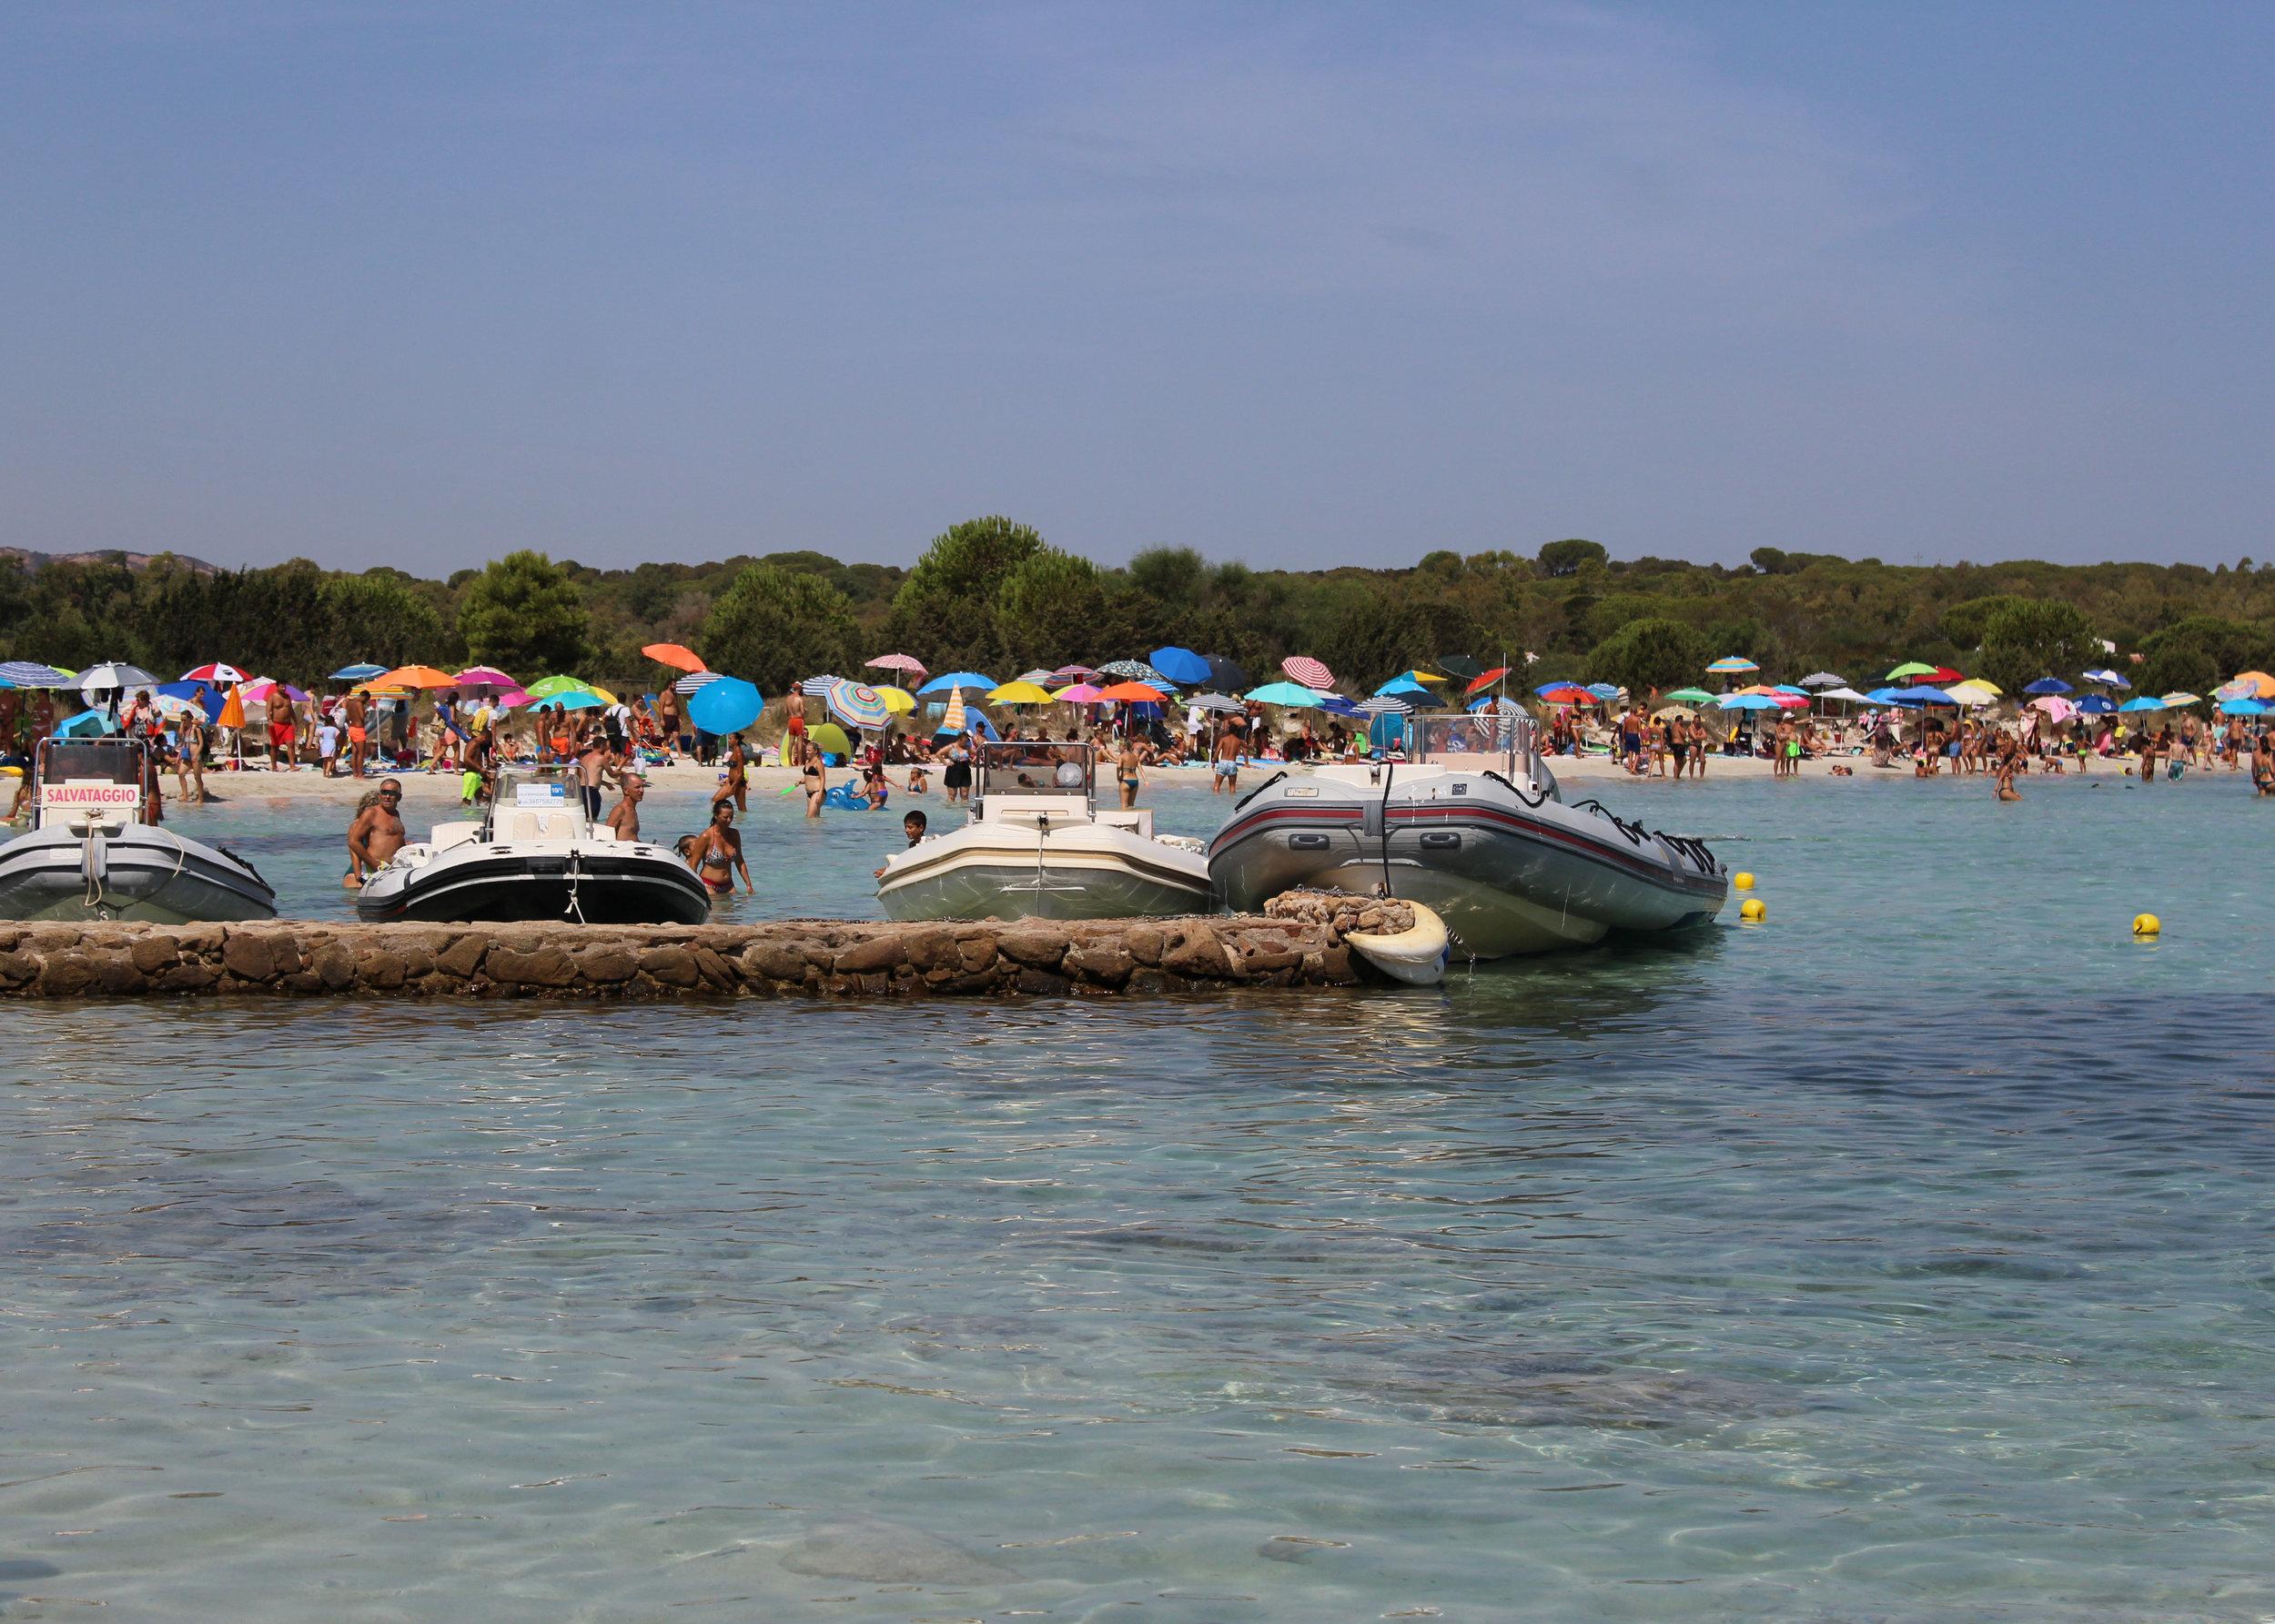 Sardinia ocean and boats  (1 of 1).jpg